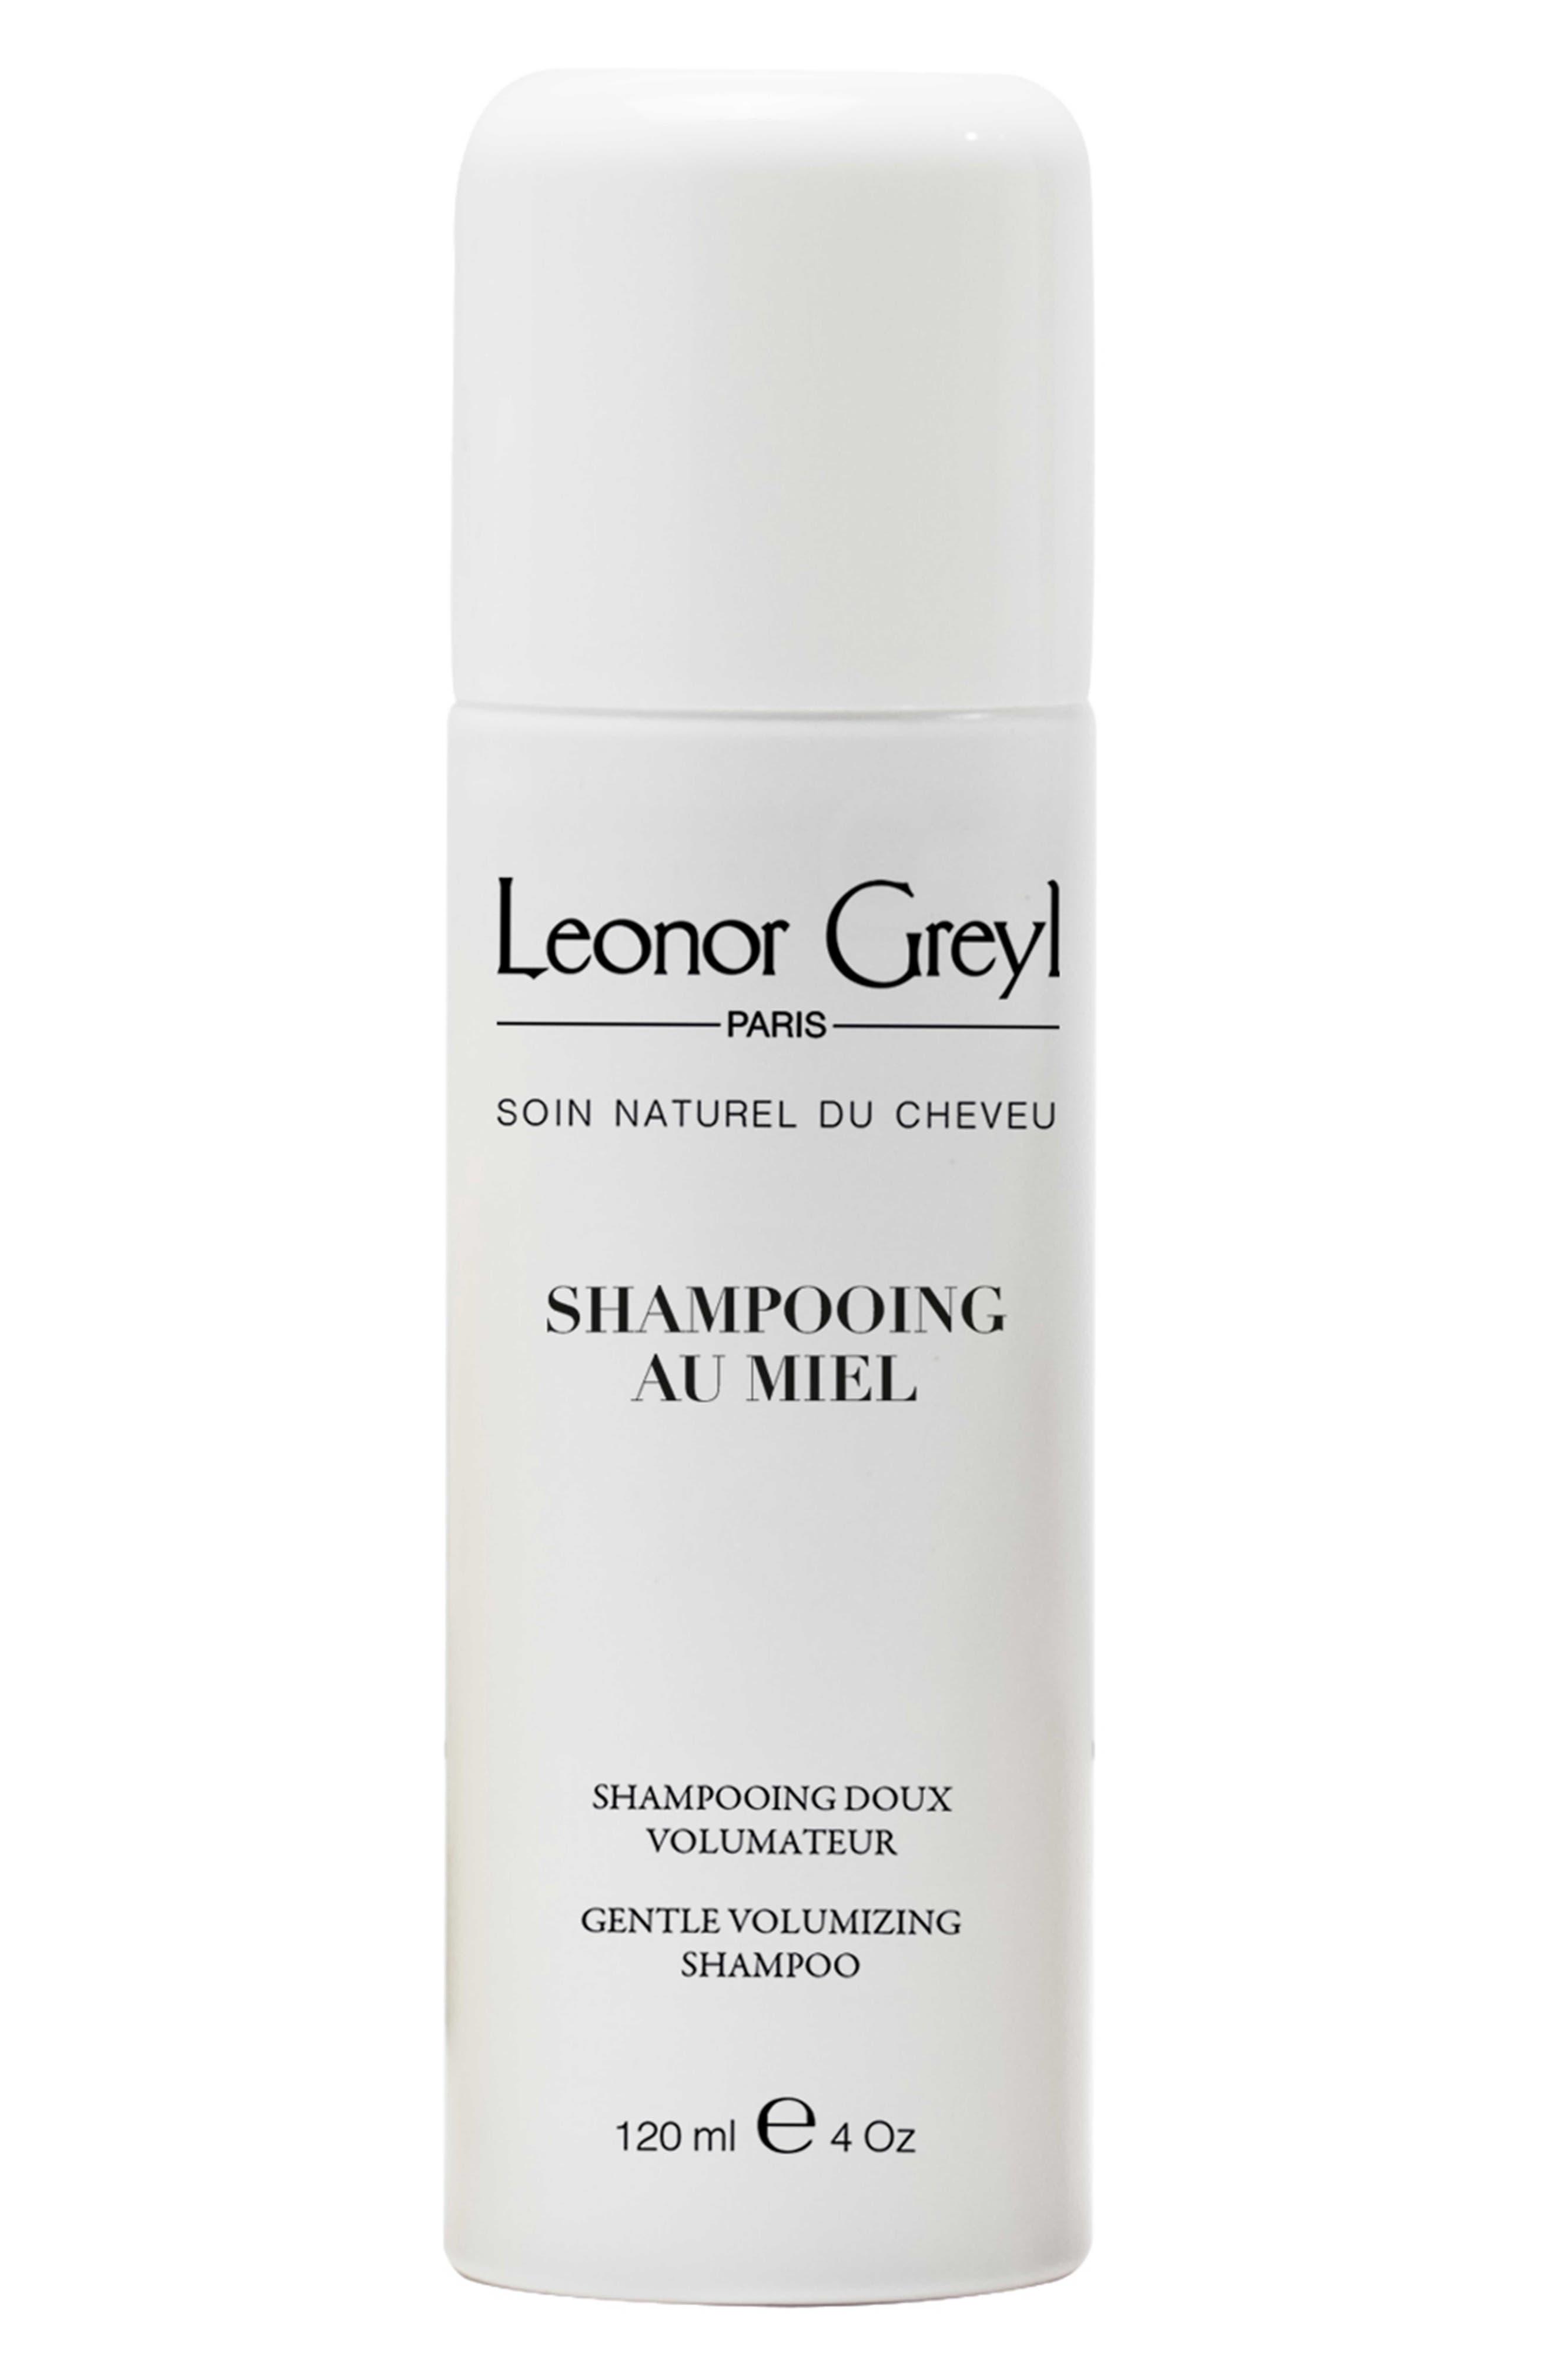 LEONOR GREYL PARIS 'Shampooing au Miel' Volumizing Shampoo, Main, color, NO COLOR